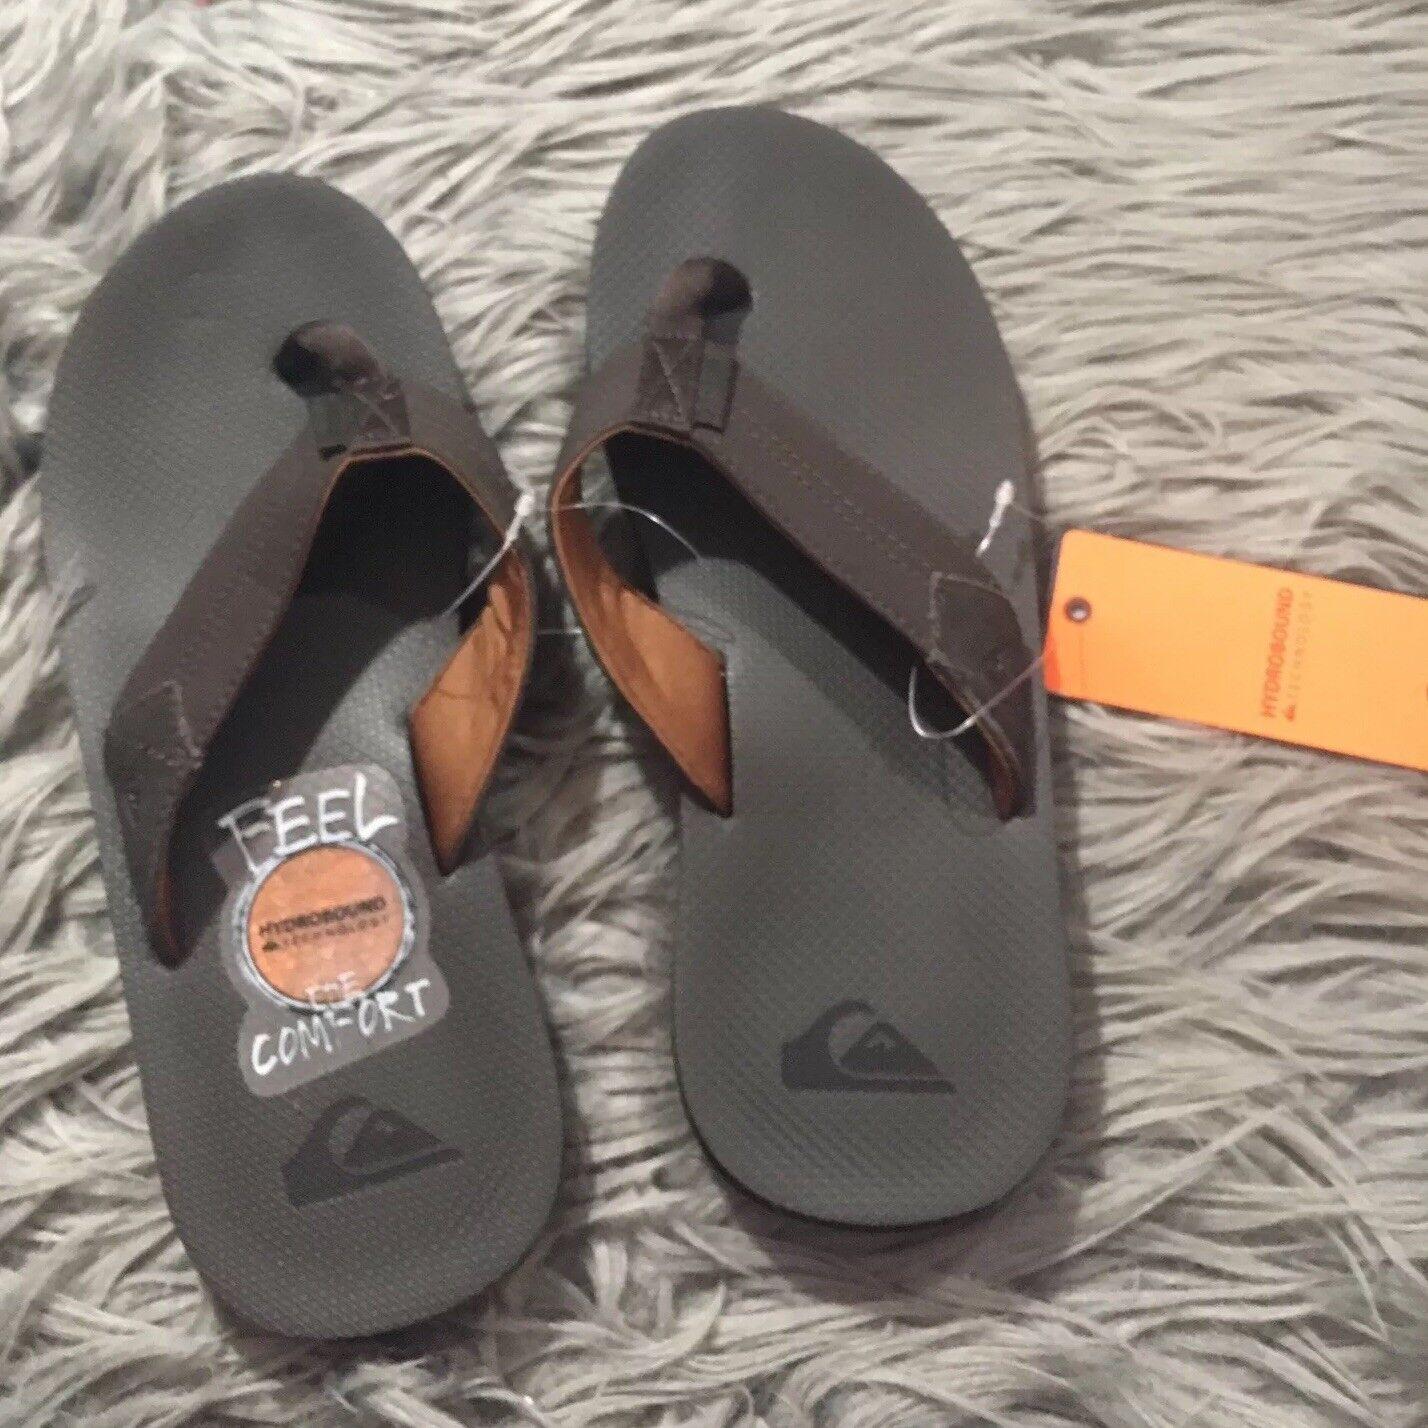 Quicksilver Coastal Oasis II 2 Sandals Flip Flops Sz 8 Brown NWT